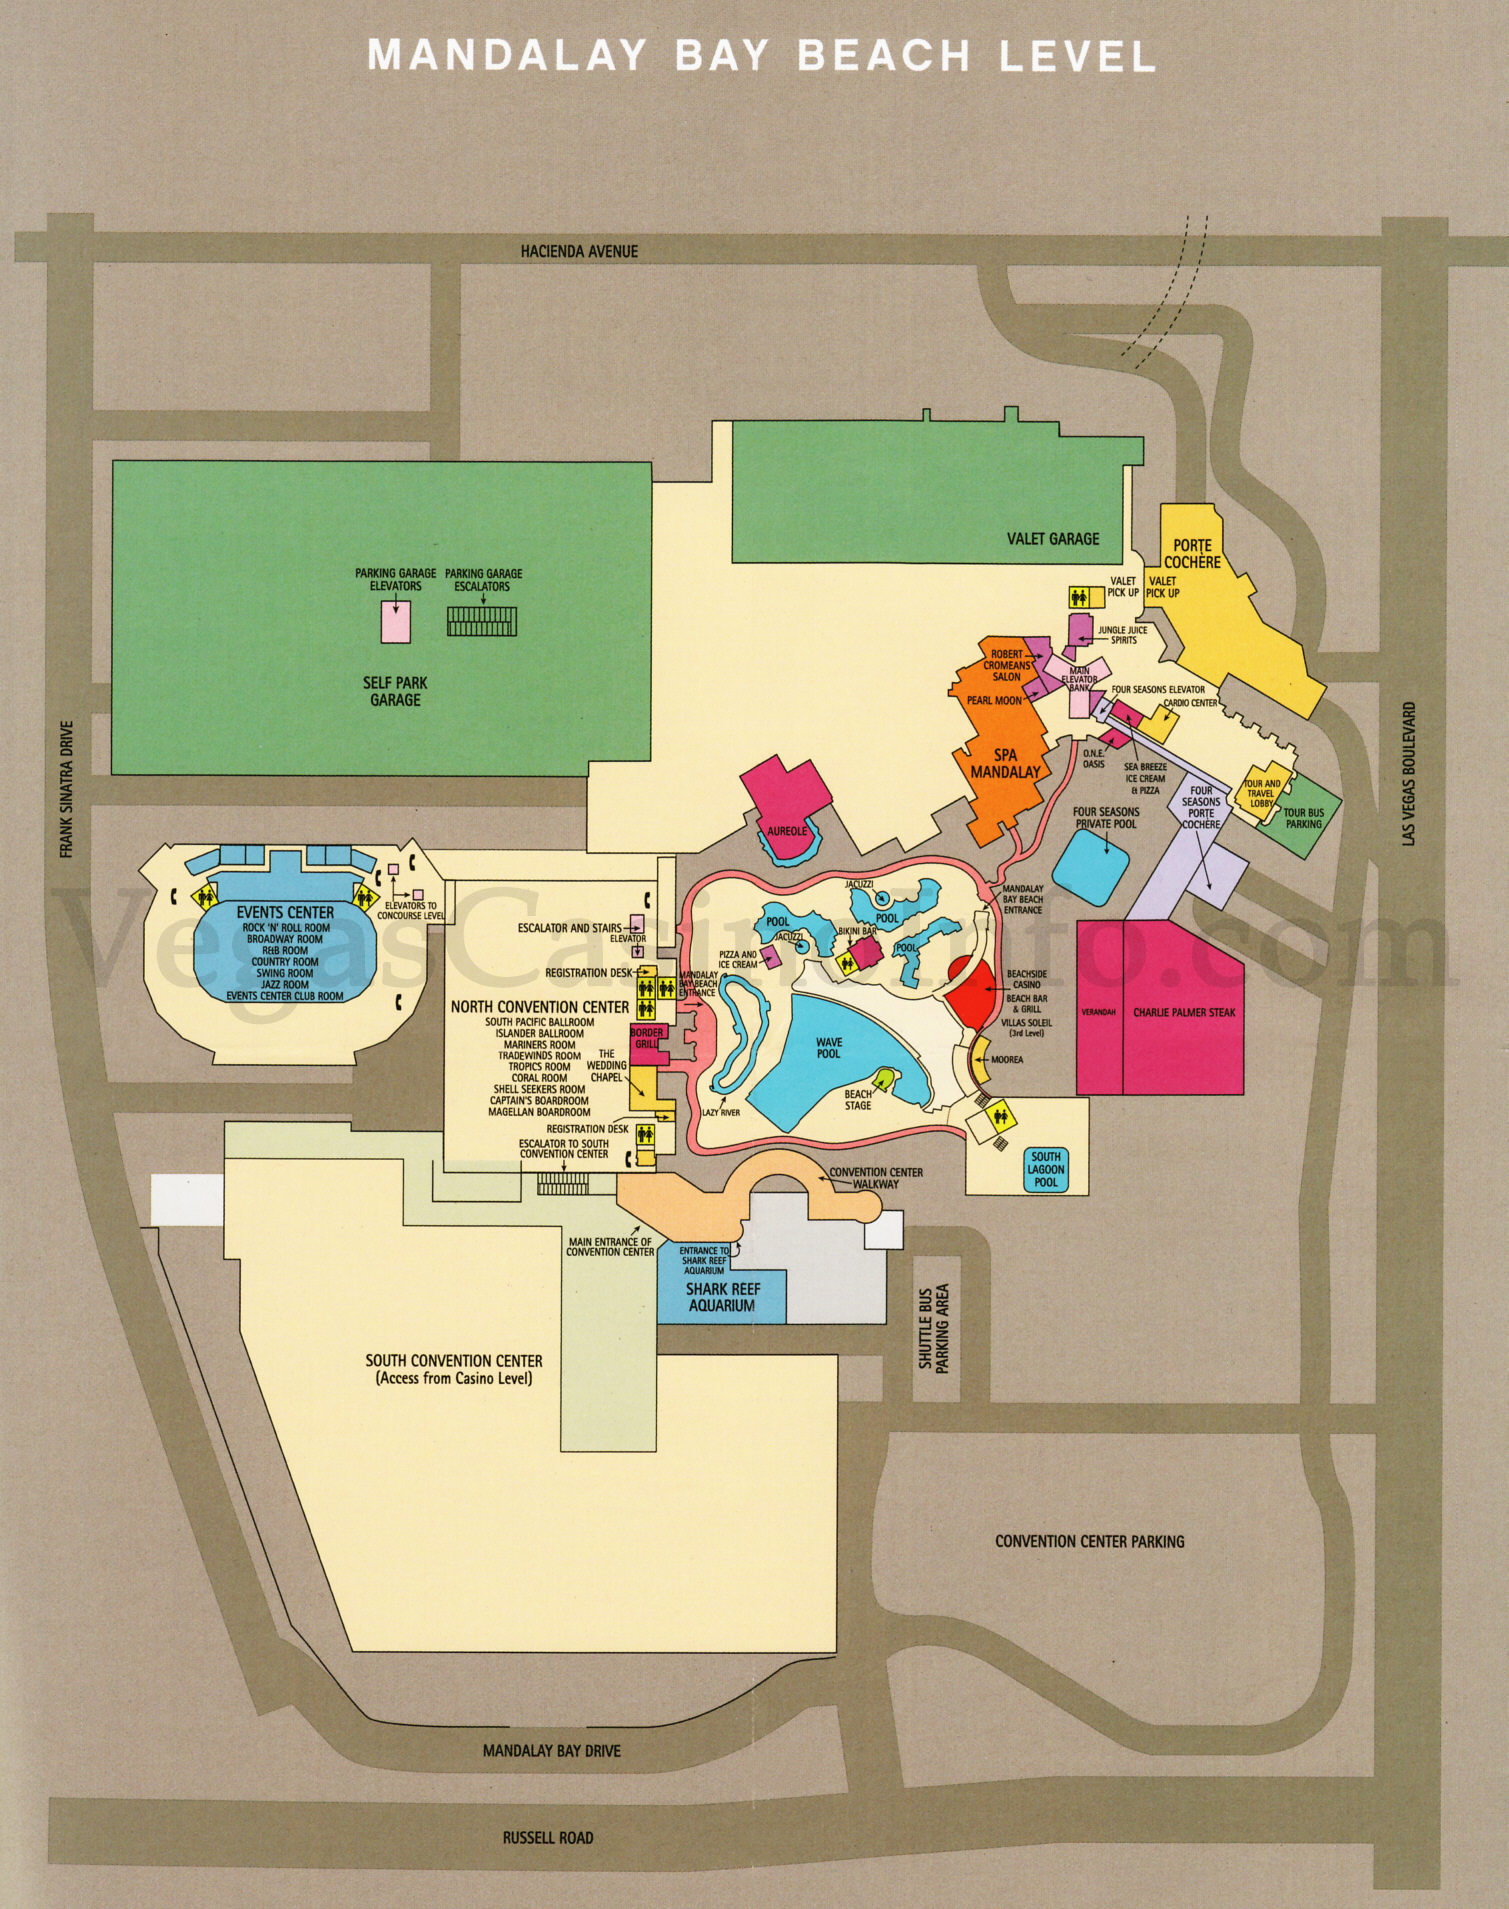 Las Vegas Casino Property Maps and Floor Plans | VegasCasinoInfo.com